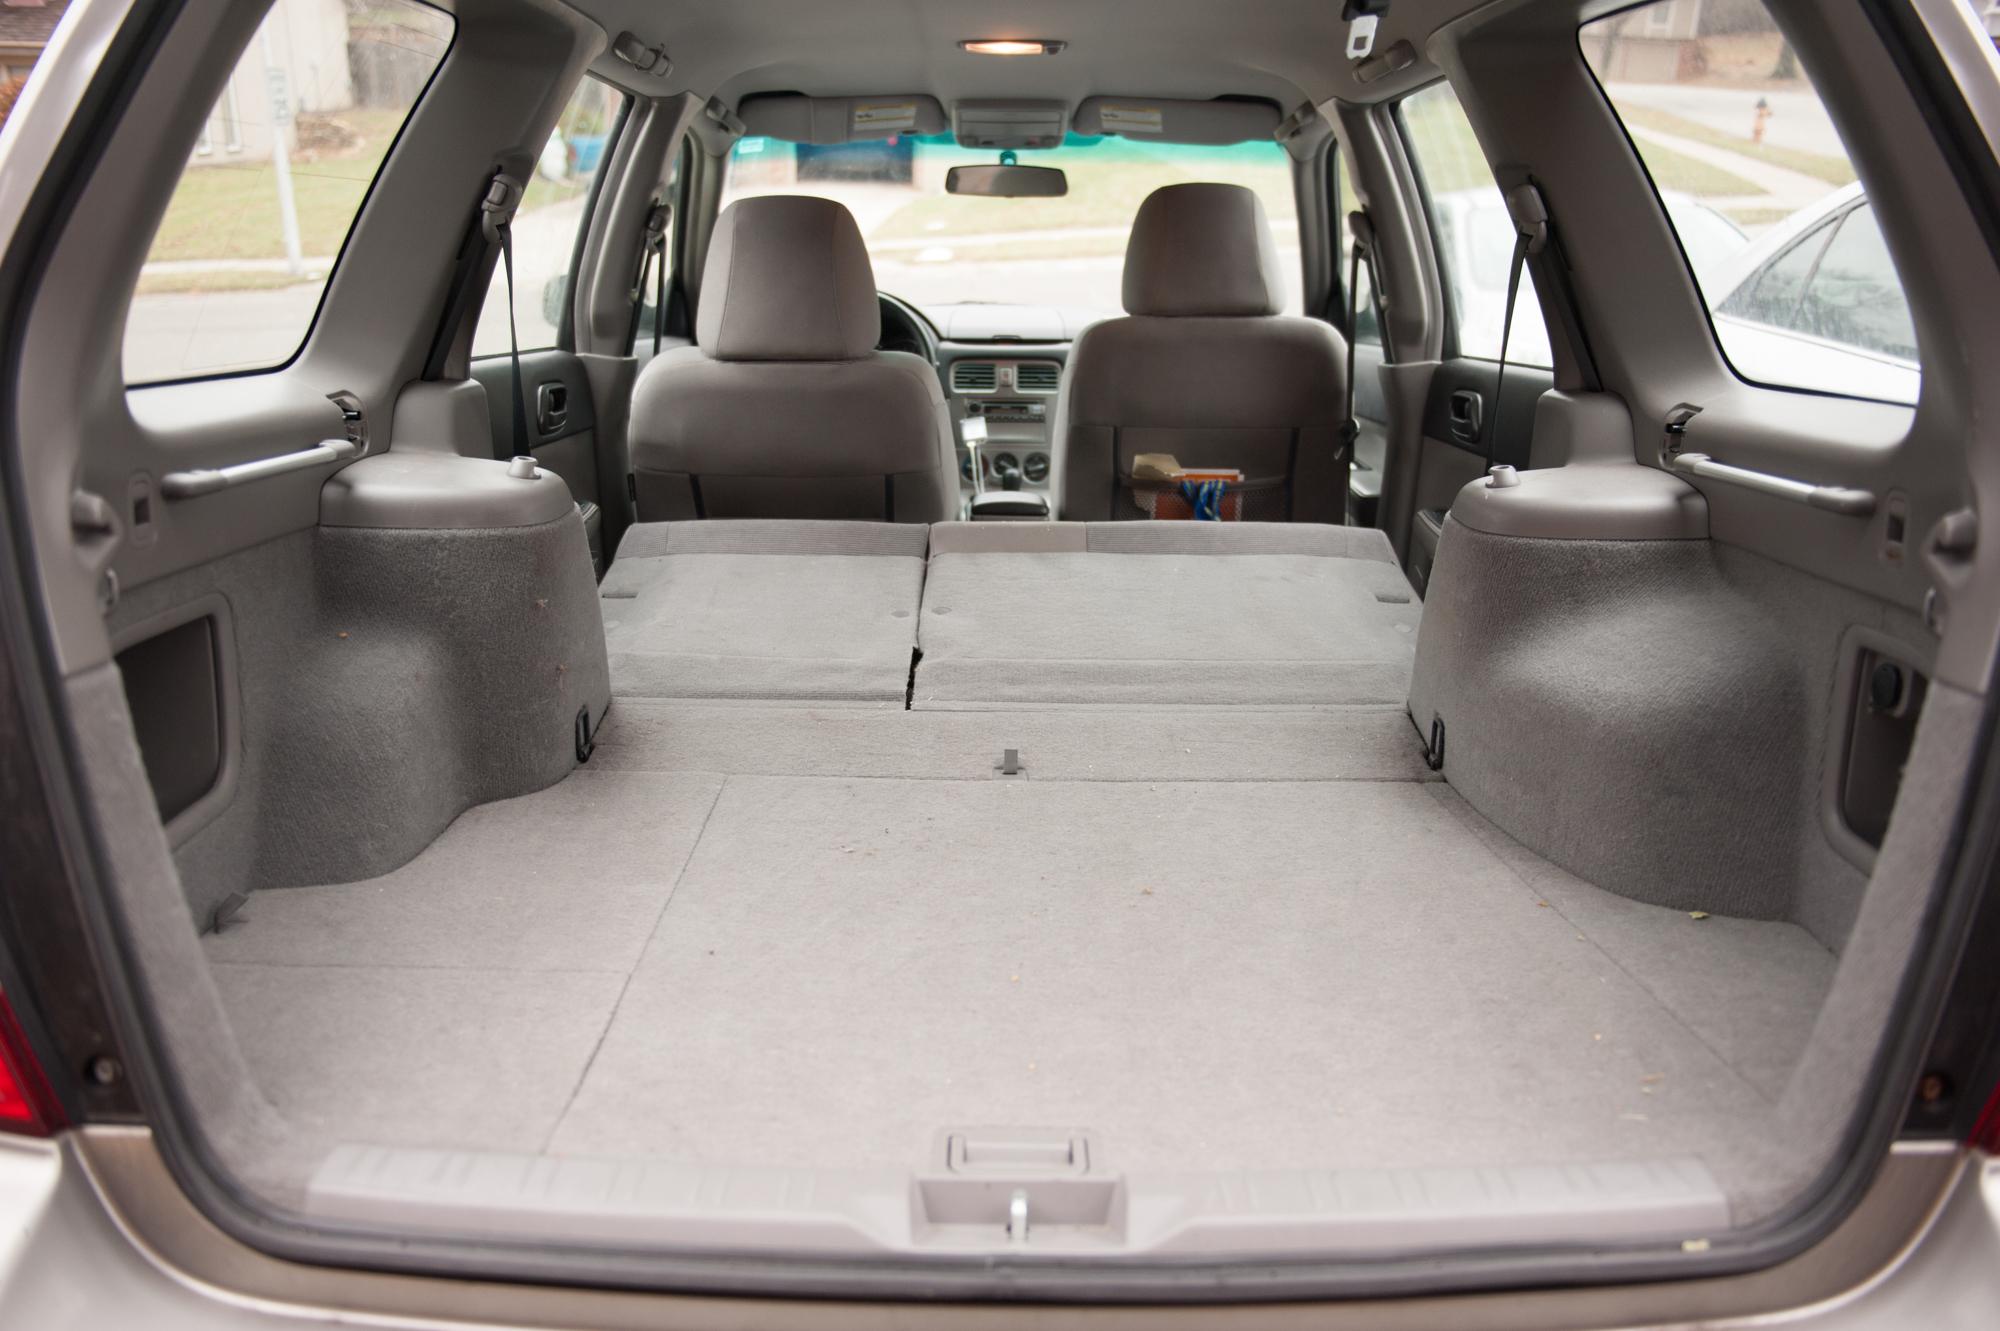 Subaru Car Camping The Setup Kevin VanEmburgh Photography